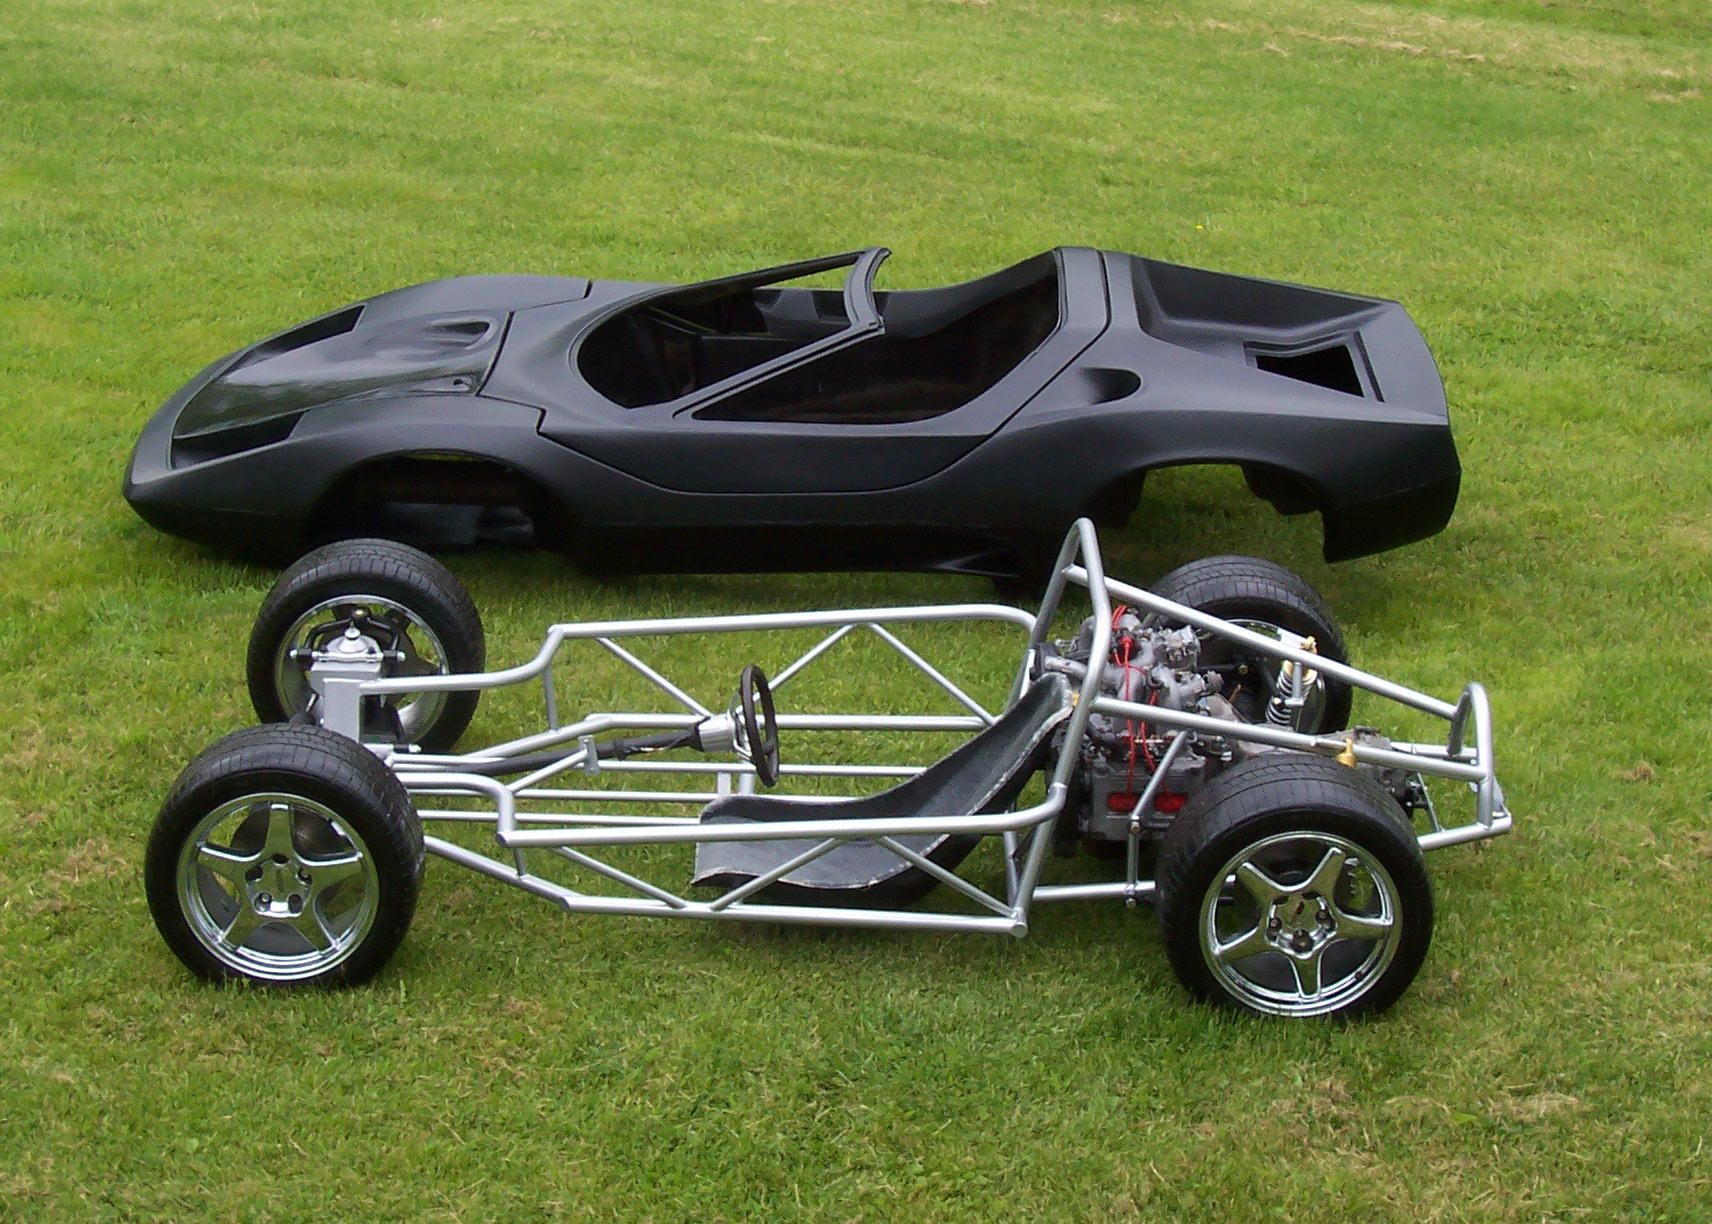 Plastic Model Cars / Trucks / Vehicles - HobbyLinc.com